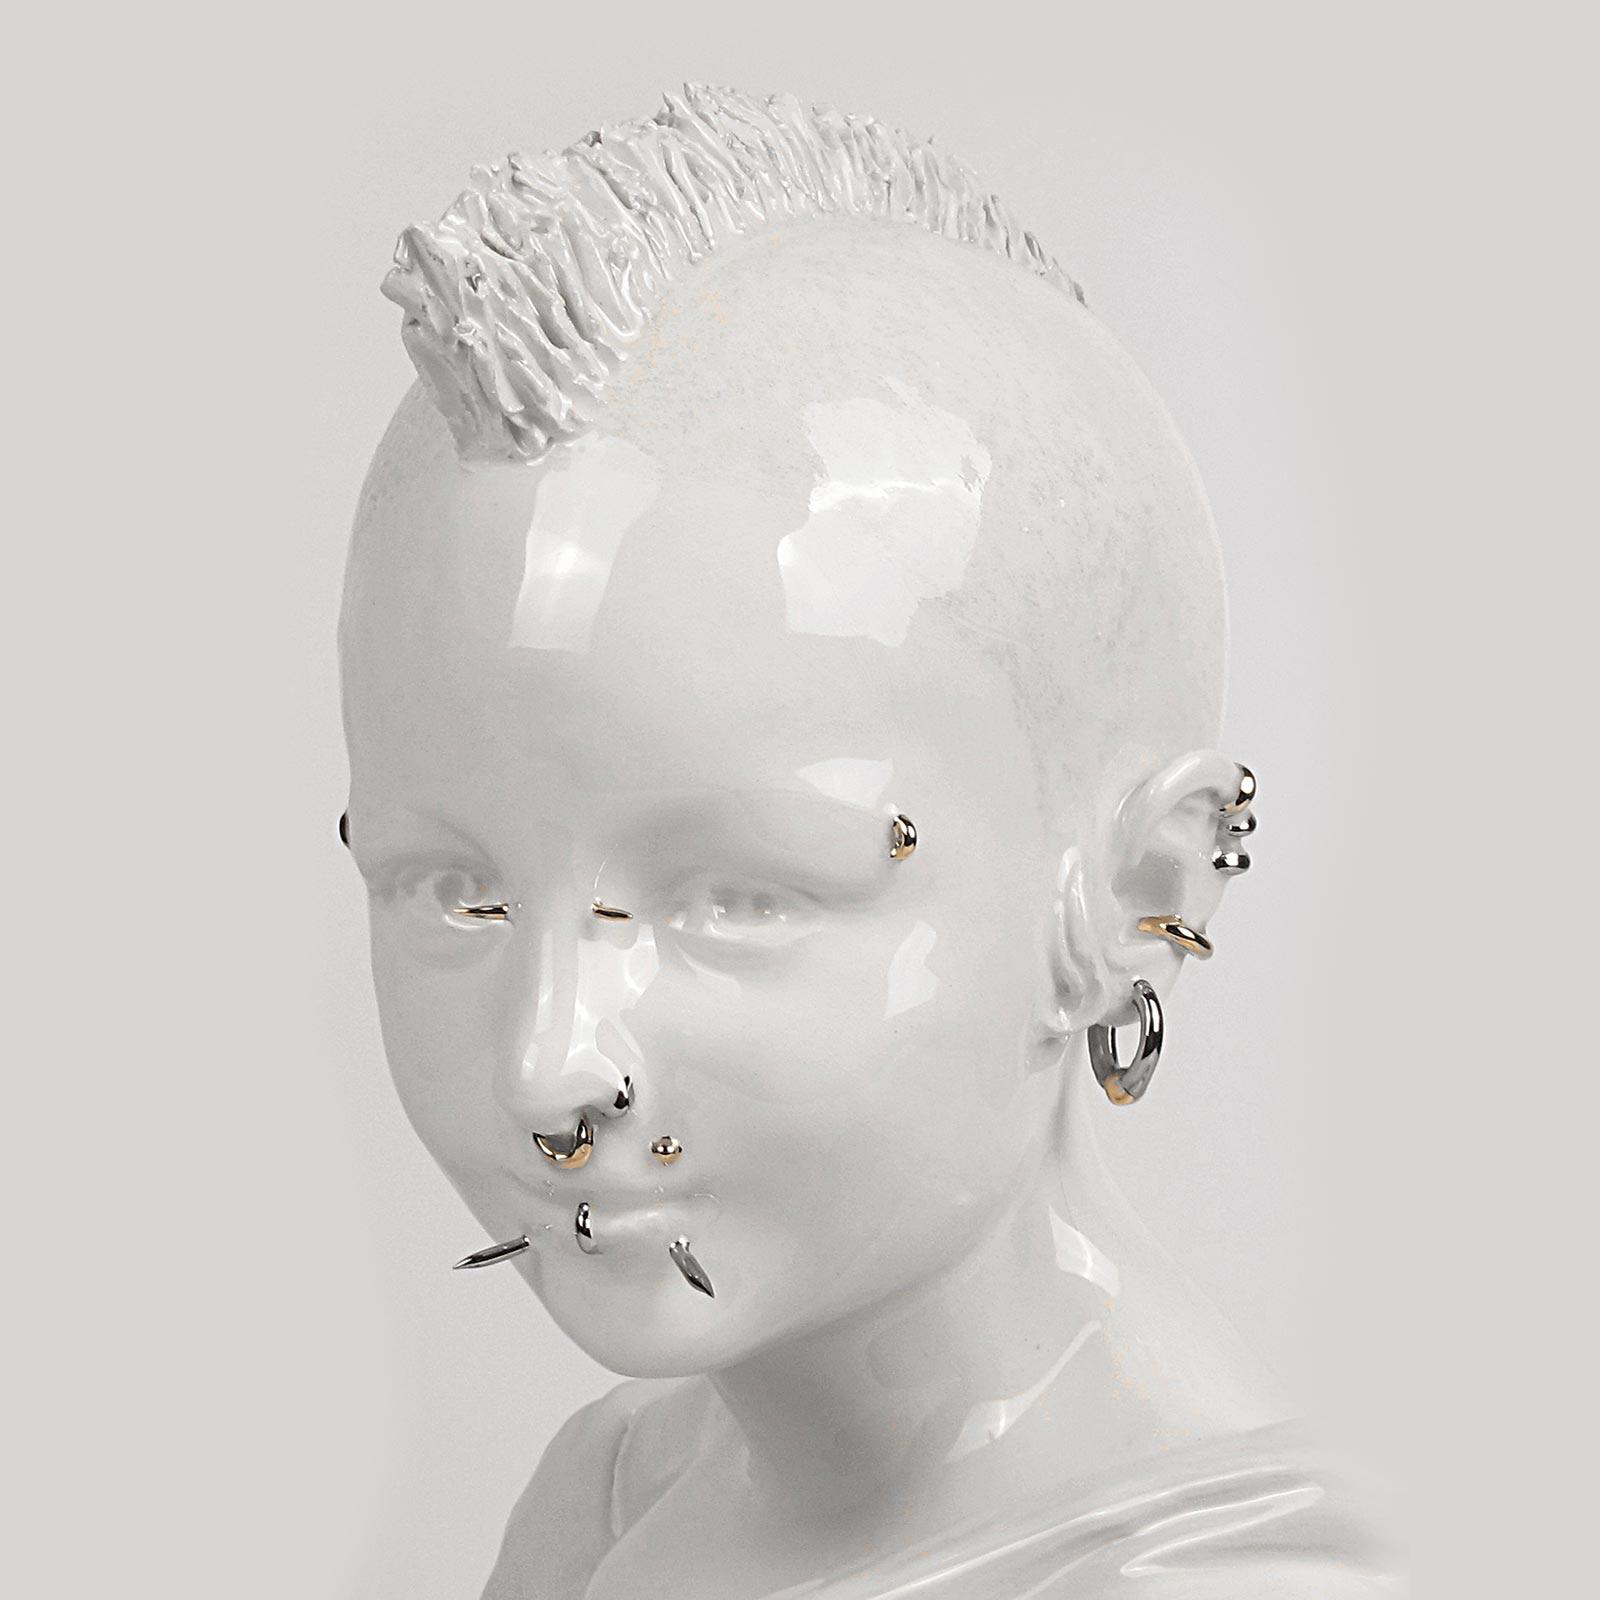 01-Gabriele-Mallegni,-Baby-punk,-detail